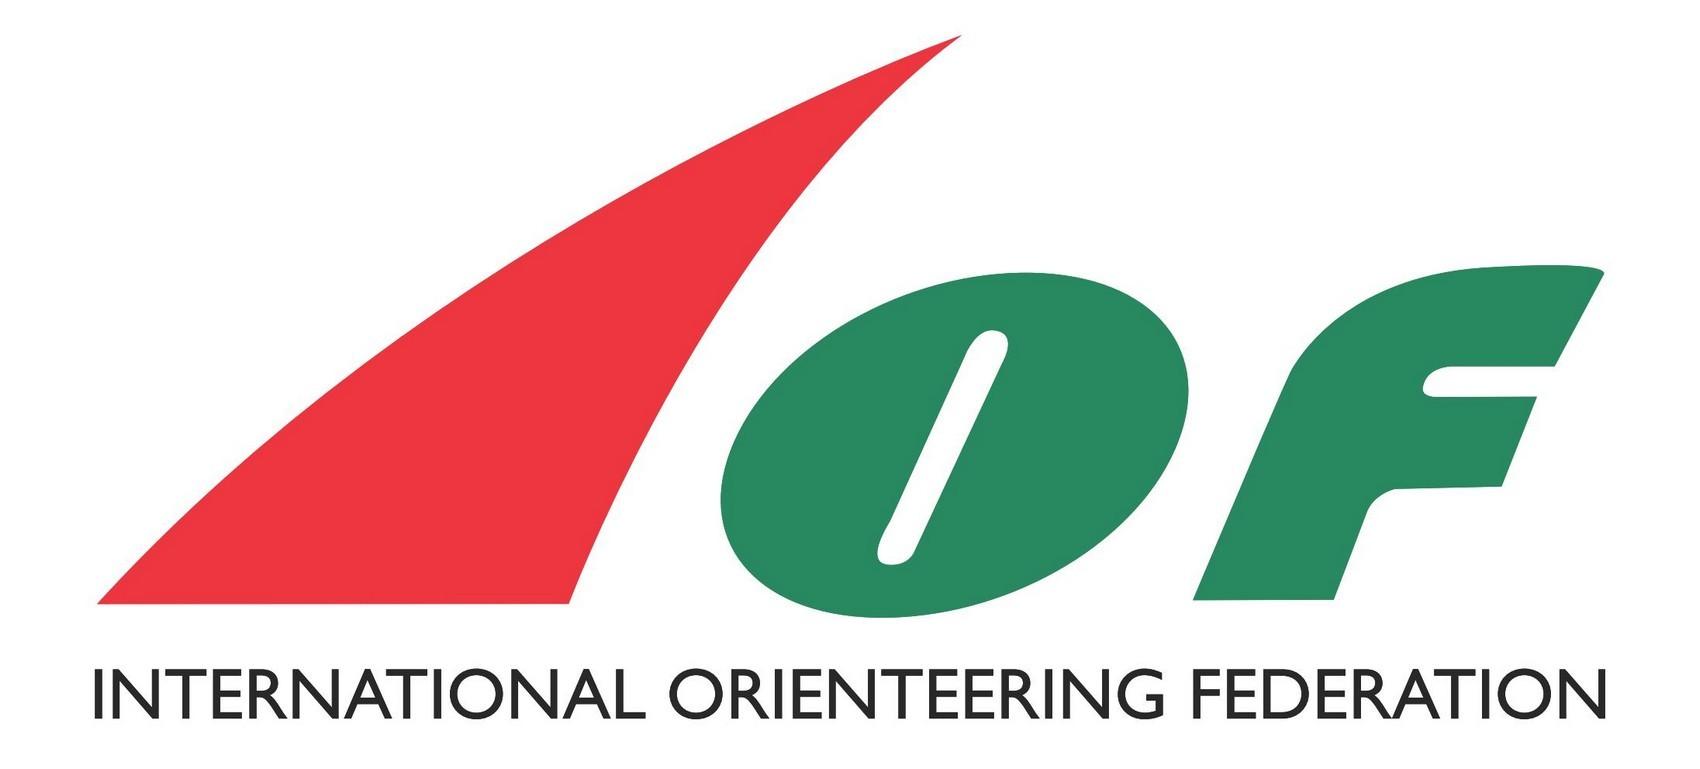 International Orienteering Federation (IOF) Logo [EPS File] png